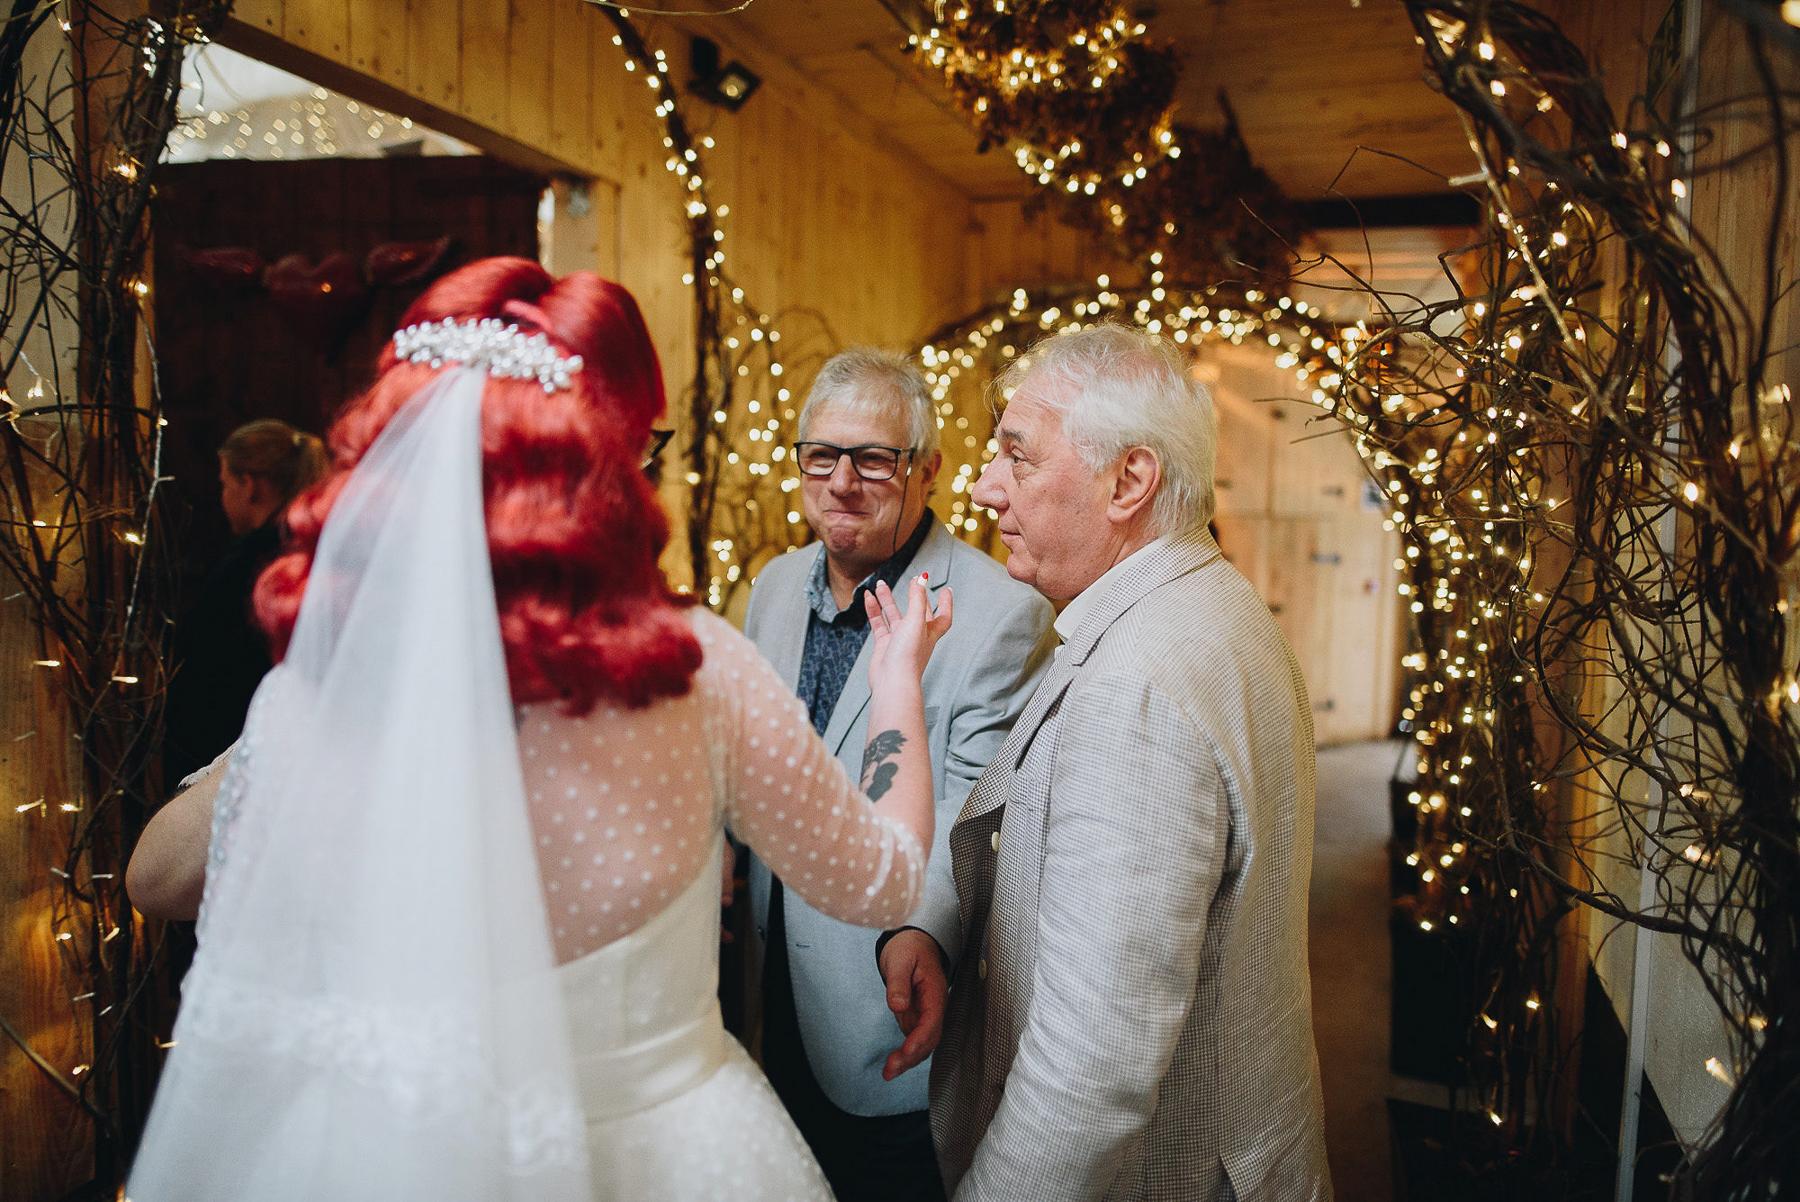 Wellbeing_Farm_Wedding_Photography_The_Pin-Up_Bride_Lara_Shaun-74.jpg